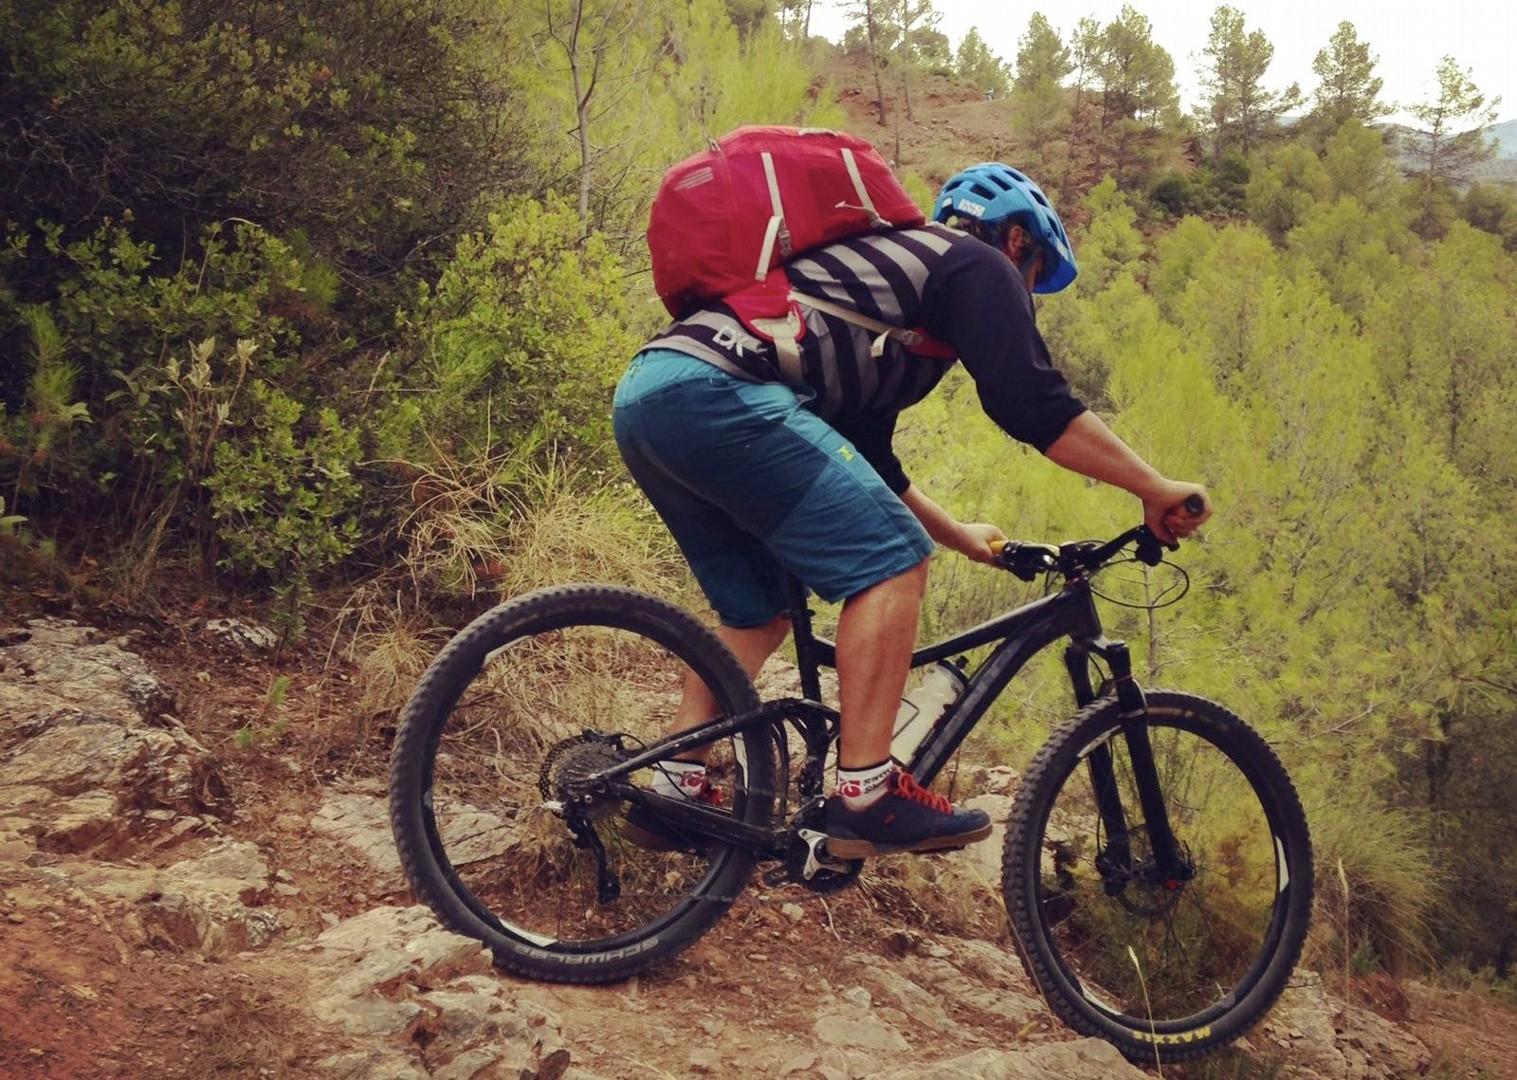 mountain-biking-holiday-menorca-trail.jpg - Spain - Menorca - Cami de Cavalls - Guided Mountain Bike Holiday - Mountain Biking